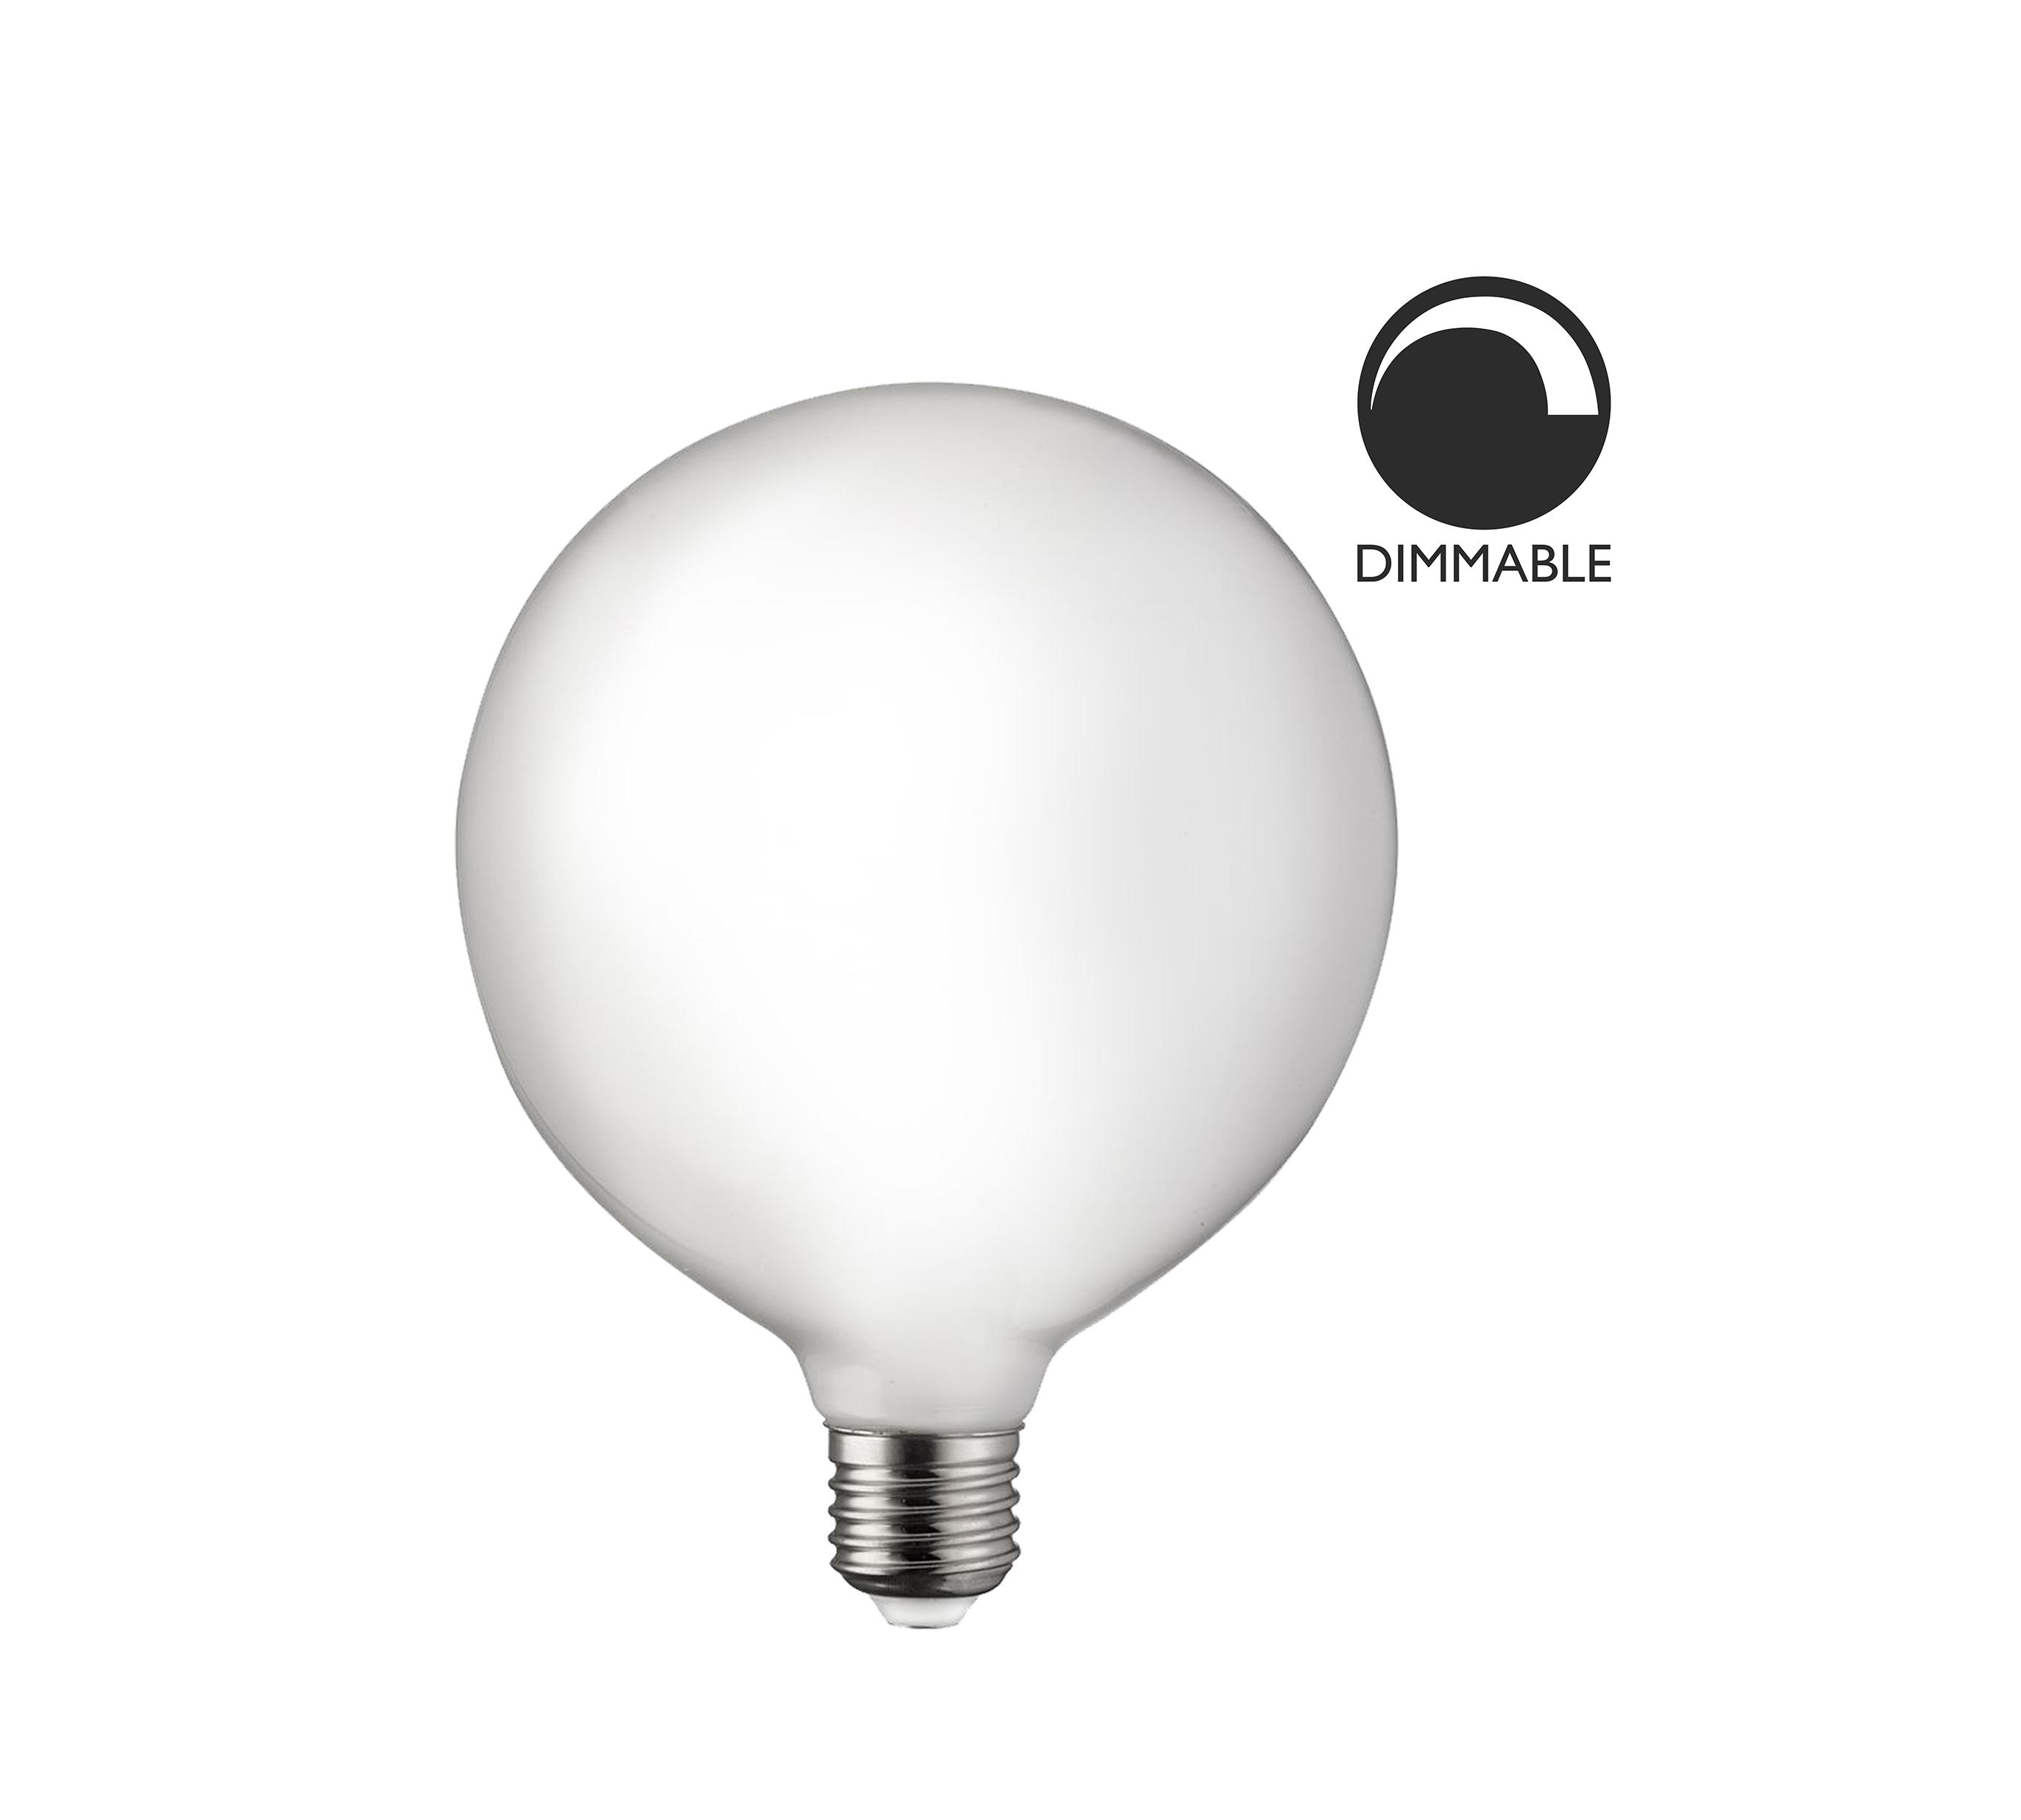 Stor klot LED lampa Opal 125 mm dimbar, Globen Lightning